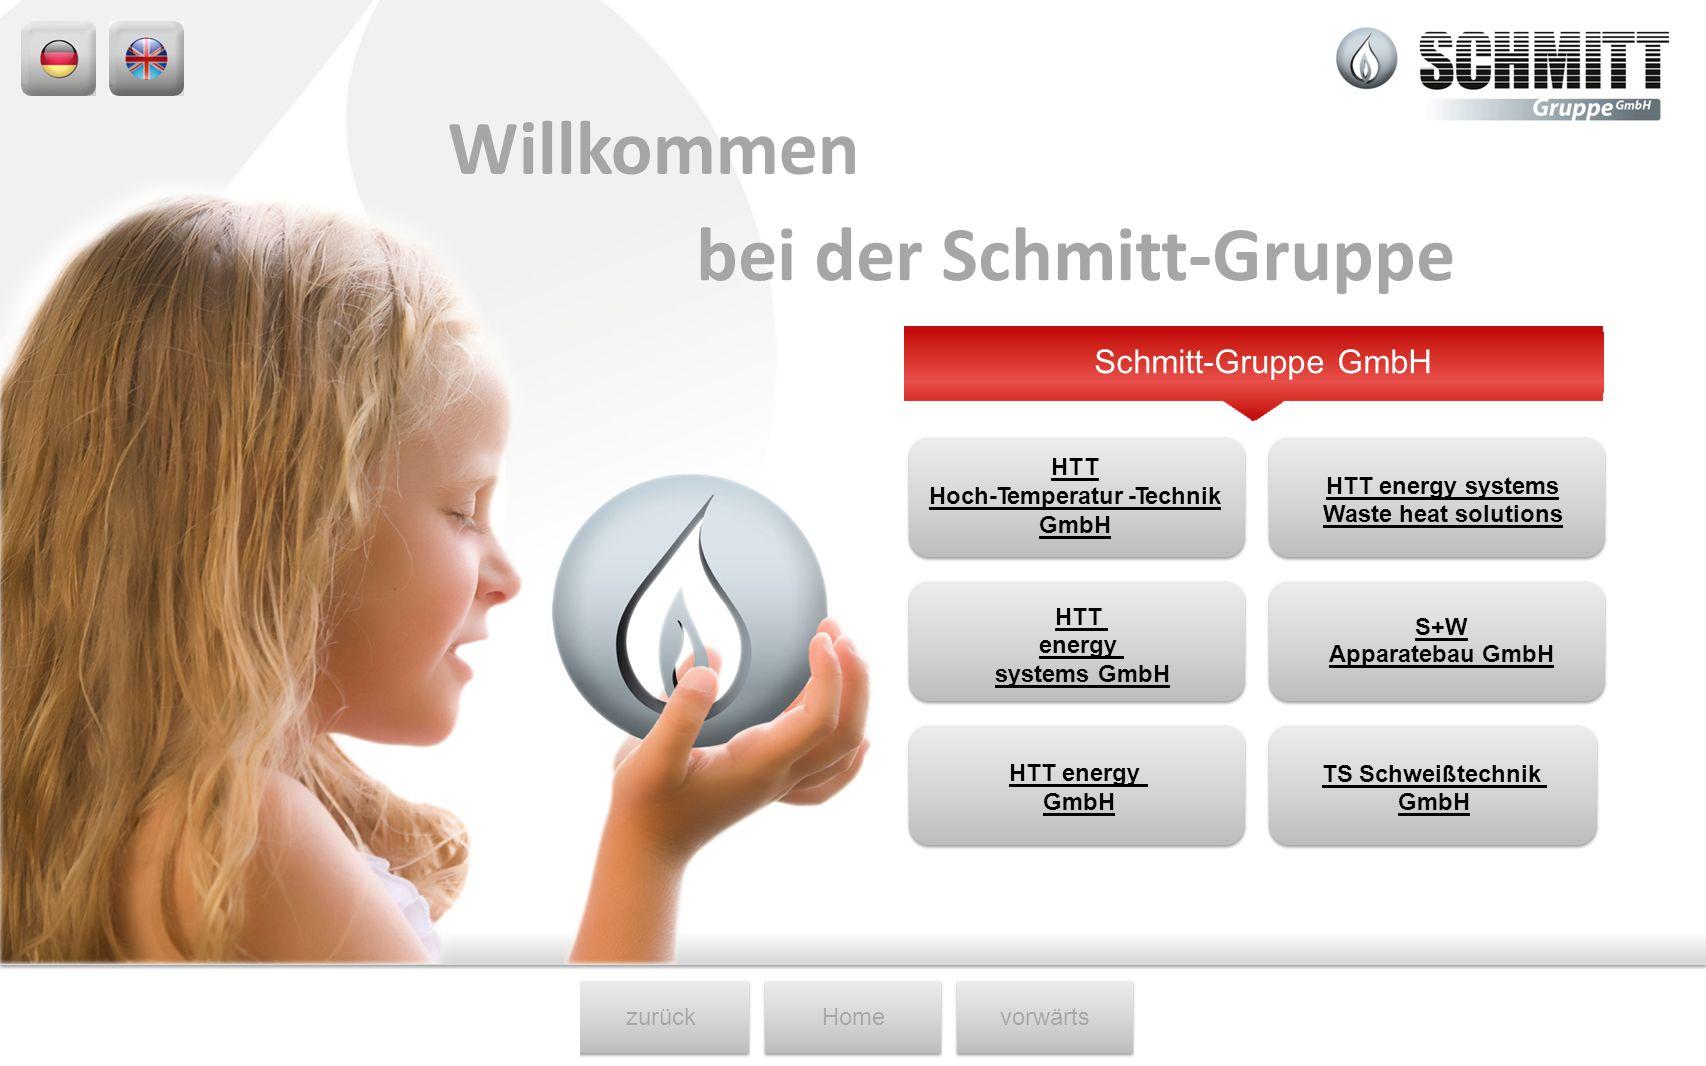 zurückHomevorwärts Schmitt-Gruppe GmbH S+W Apparatebau GmbH HT Hoch-Temperatur -Technik GmbH HTT energy systems Waste heat solutions HTT energy GmbH H